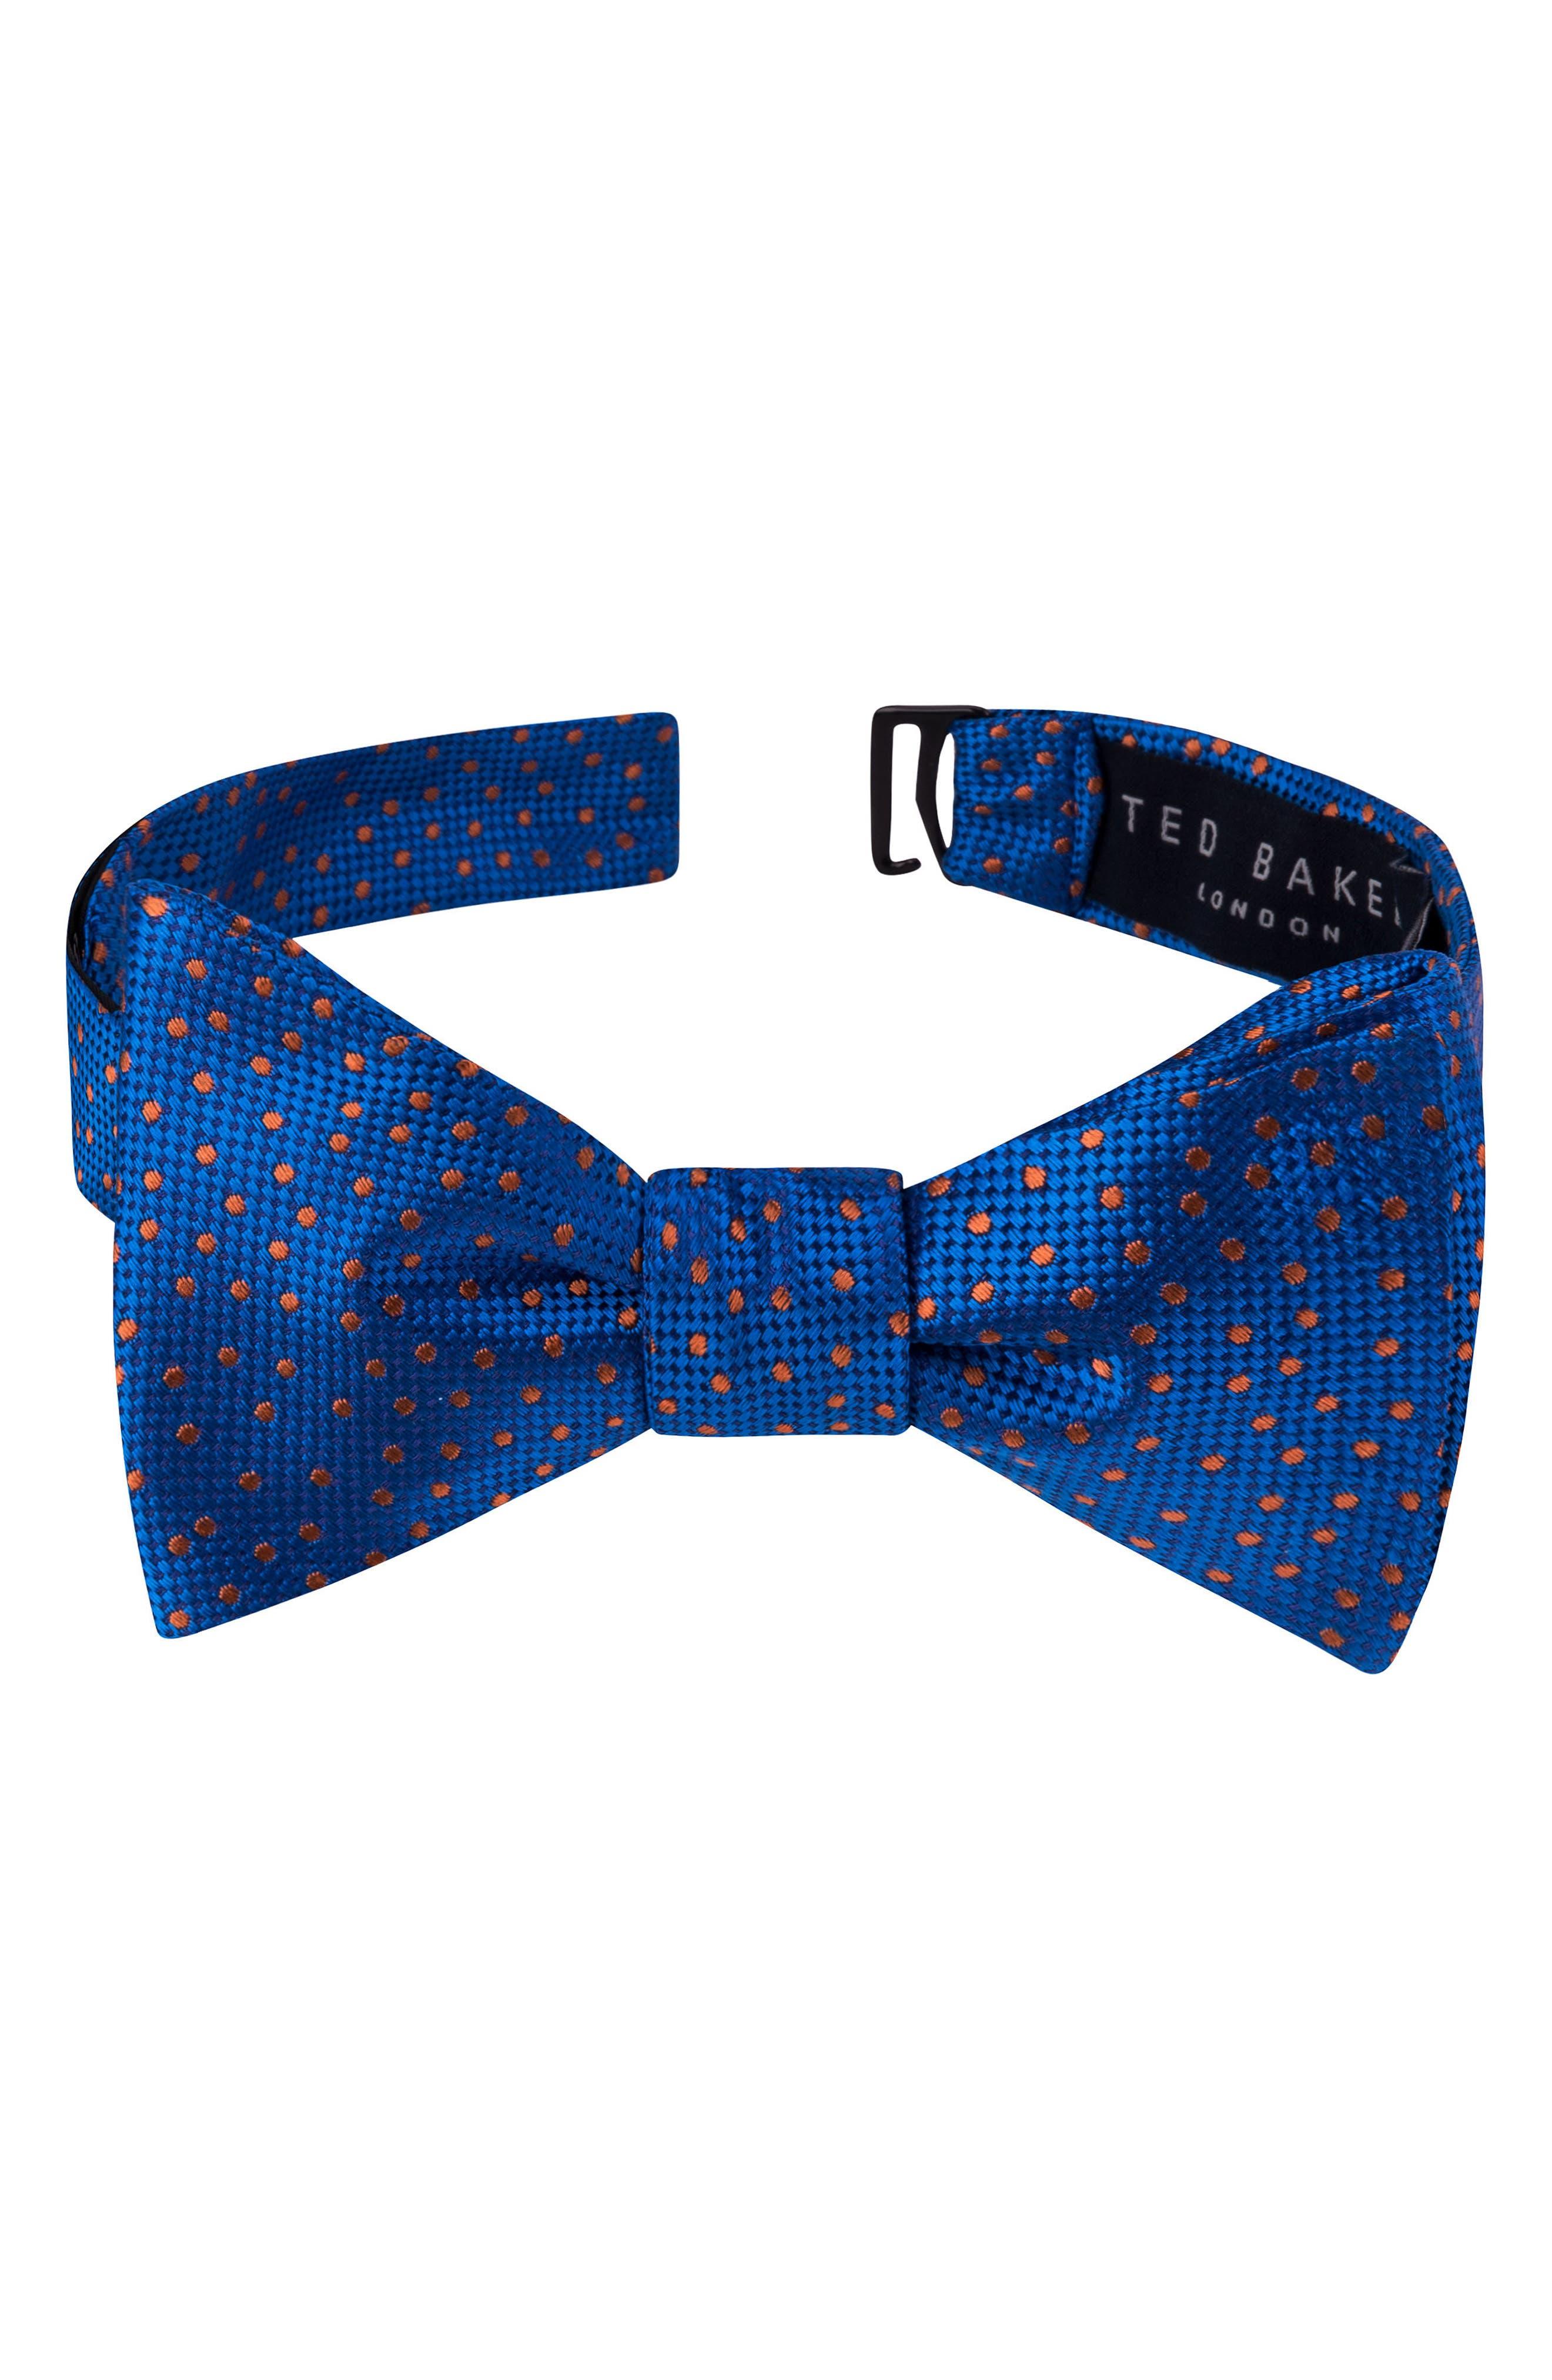 Main Image - Ted Baker London Jacquard Micro Dot Silk Bow Tie